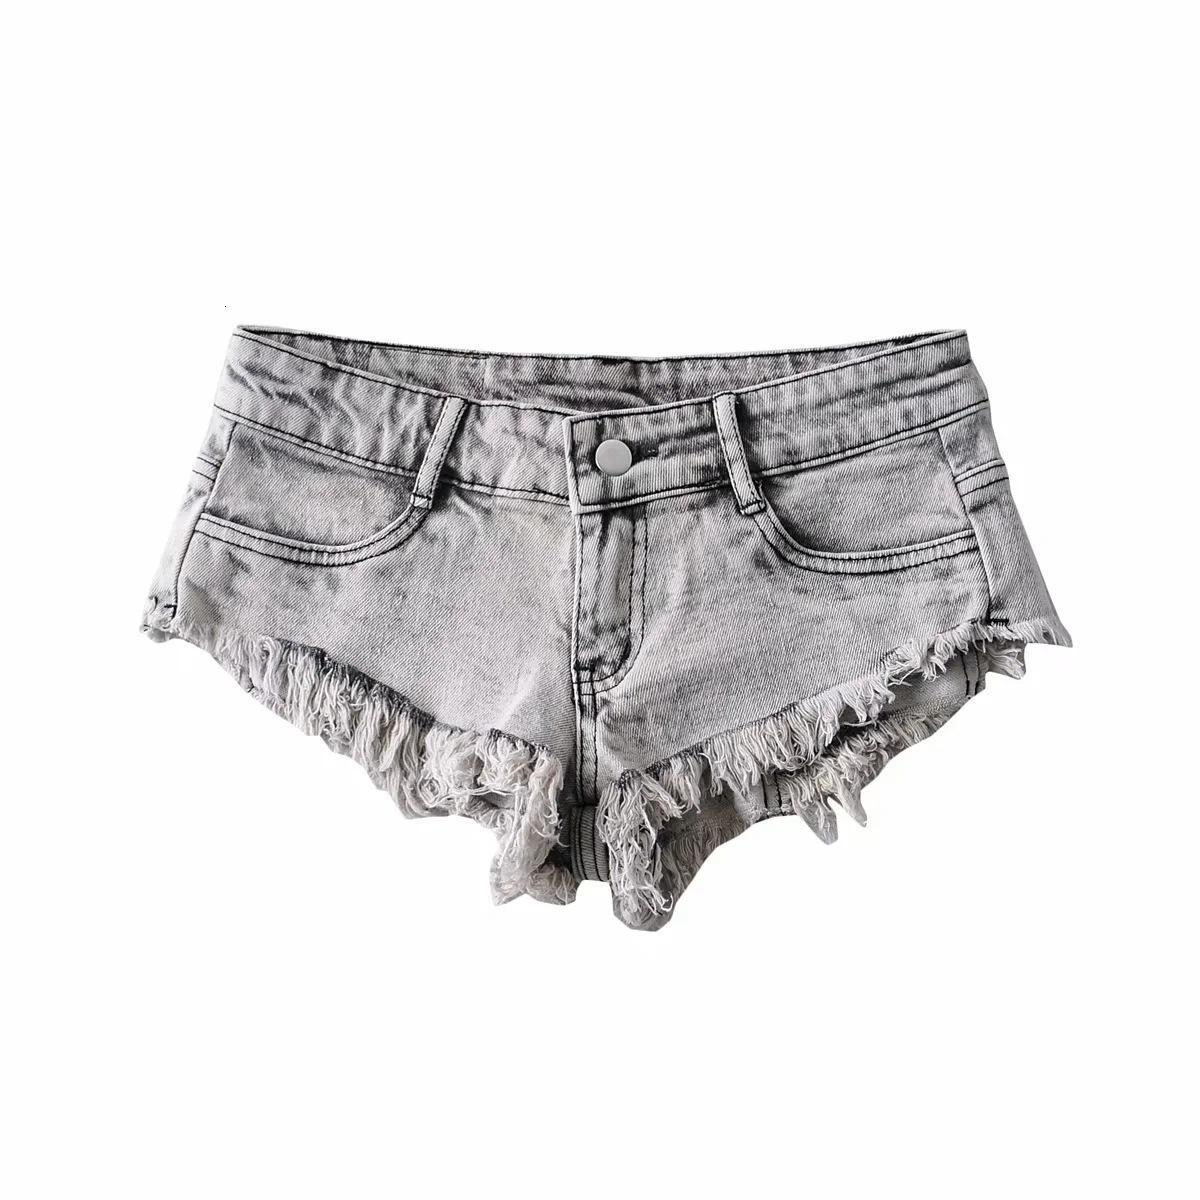 2021 Verano Baja Cintura Raw EE Women Jeans Shorts Wash Wash Ultra Short Denim Pants Wear Wear